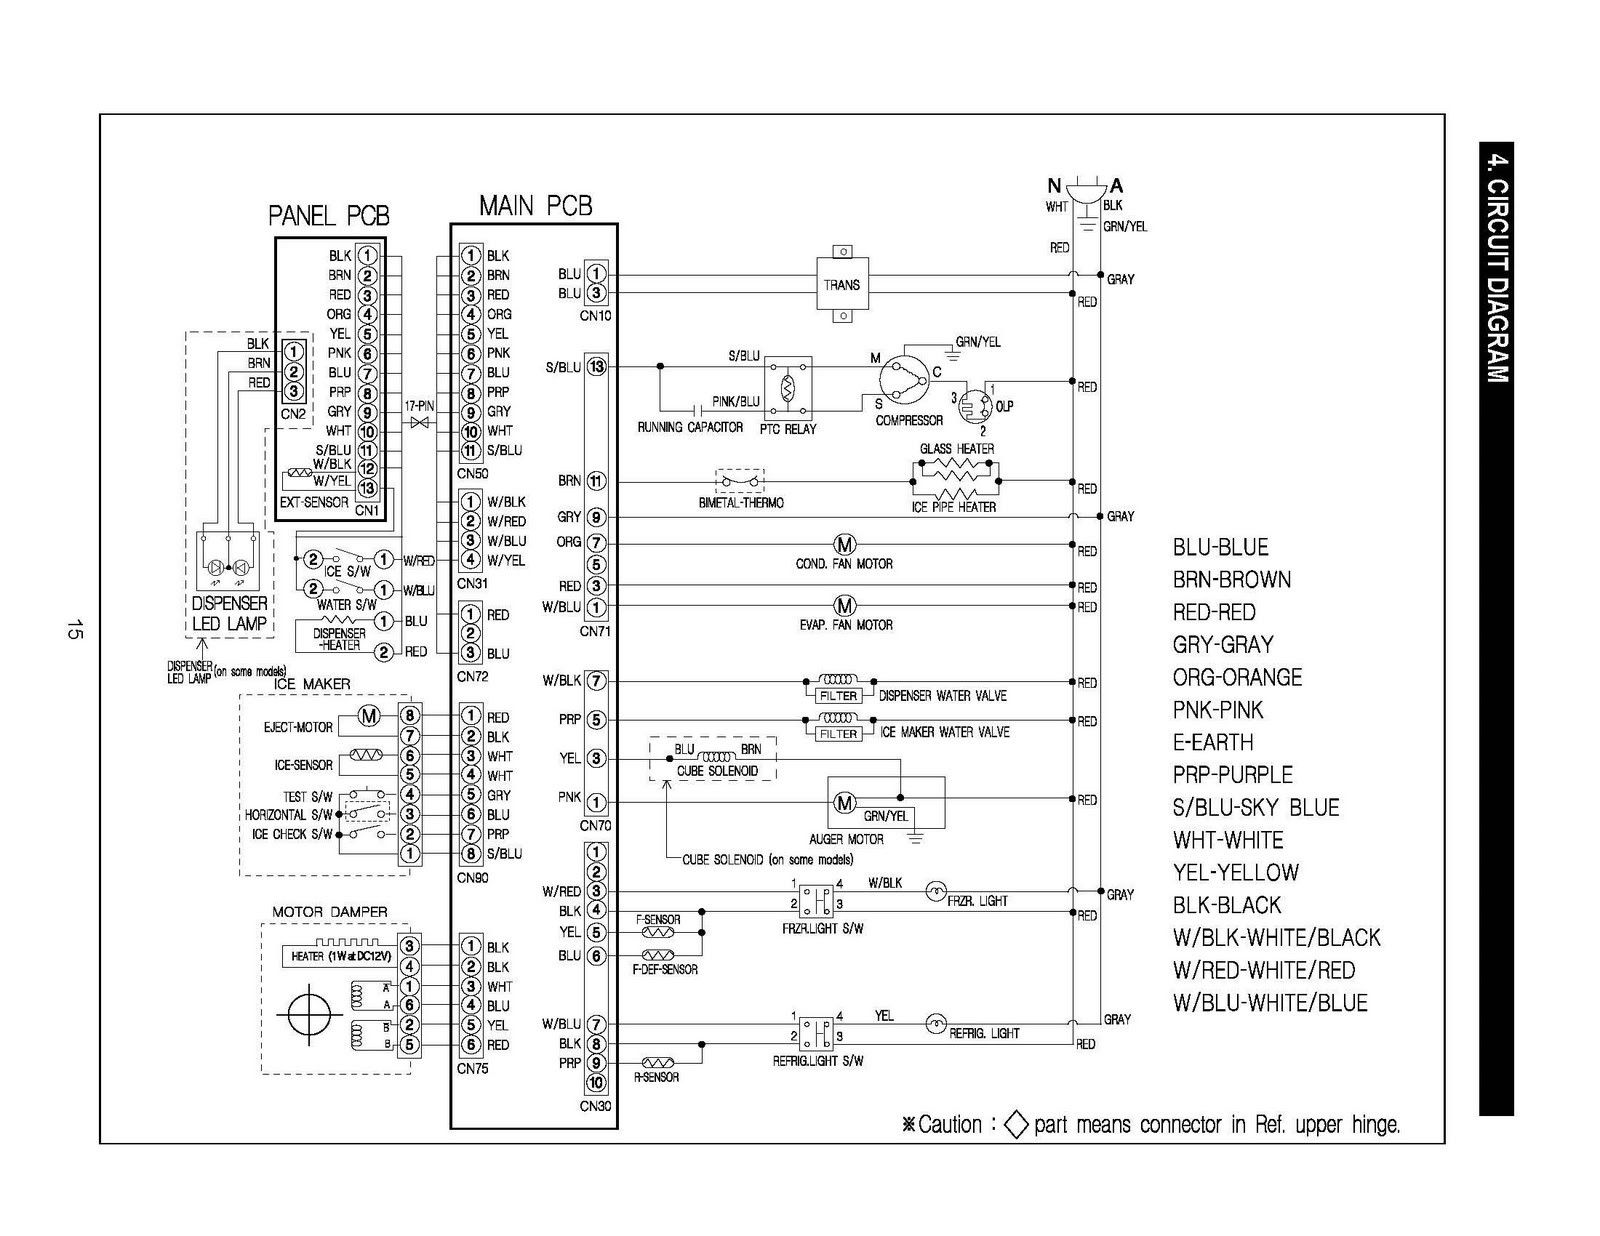 Wiring Diagram For Ge Refrigerator Car Alarm Diagrams Free Download Best Of Monogram